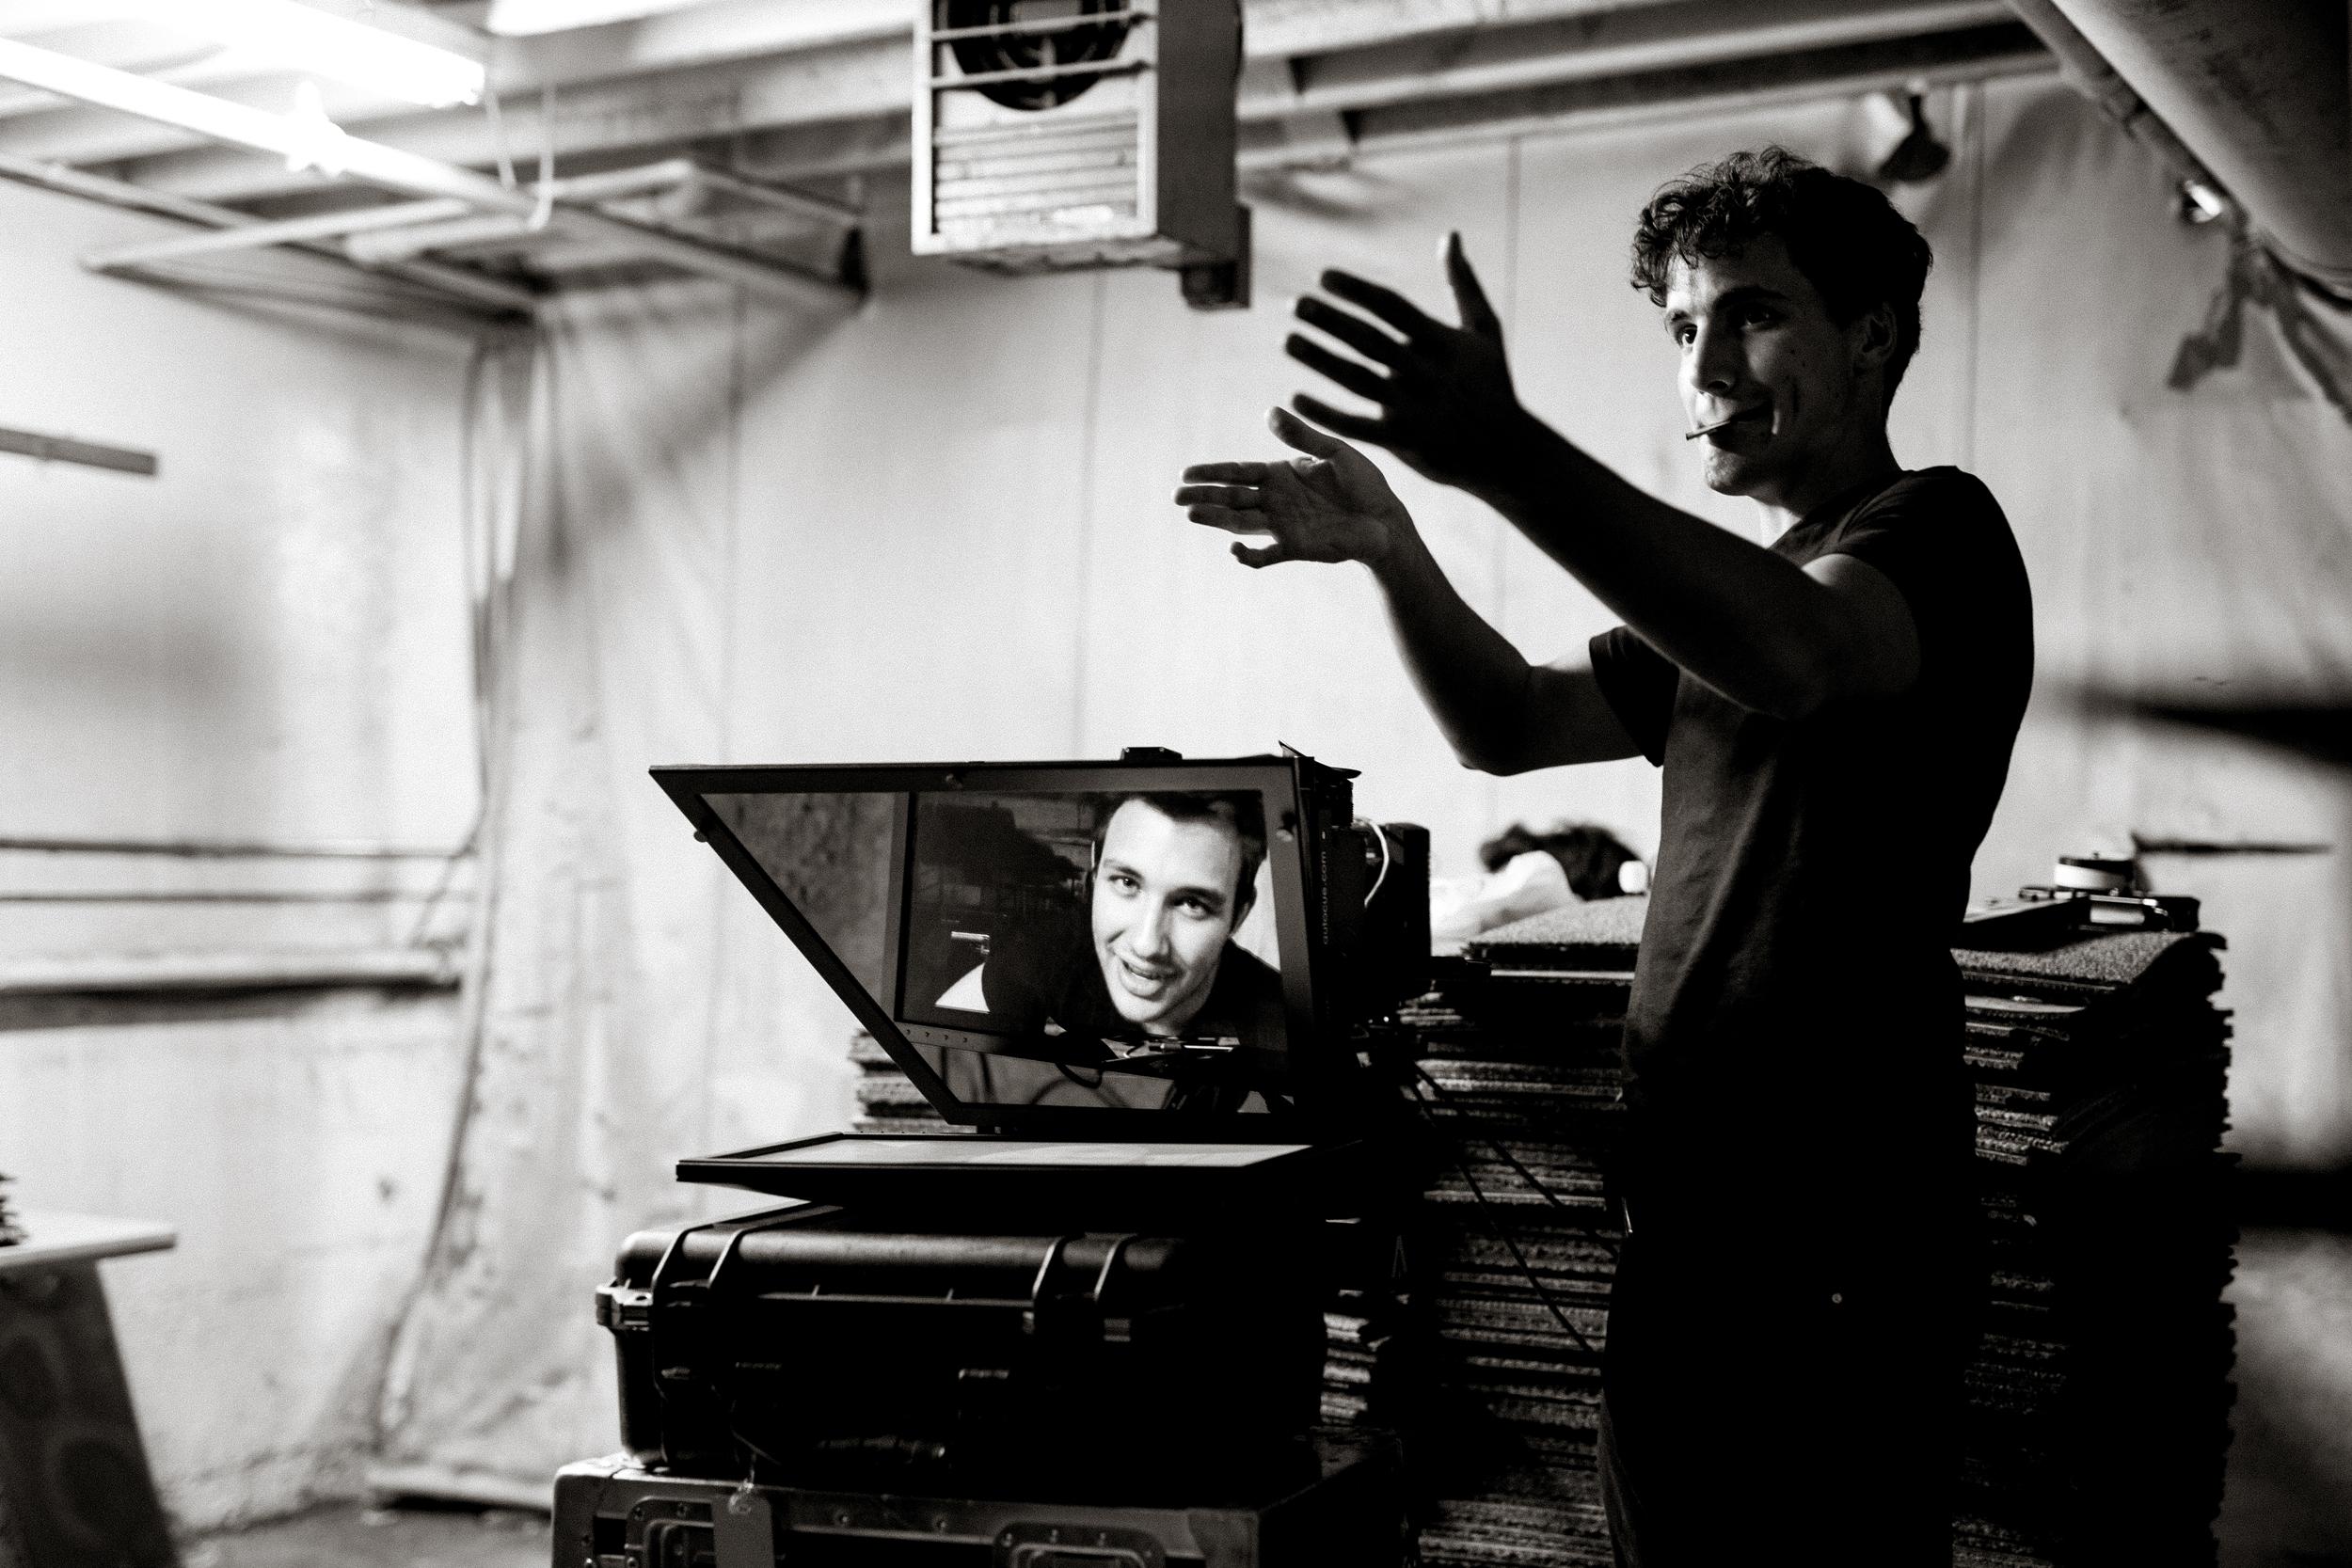 Ben Proudfoot and David Bolen